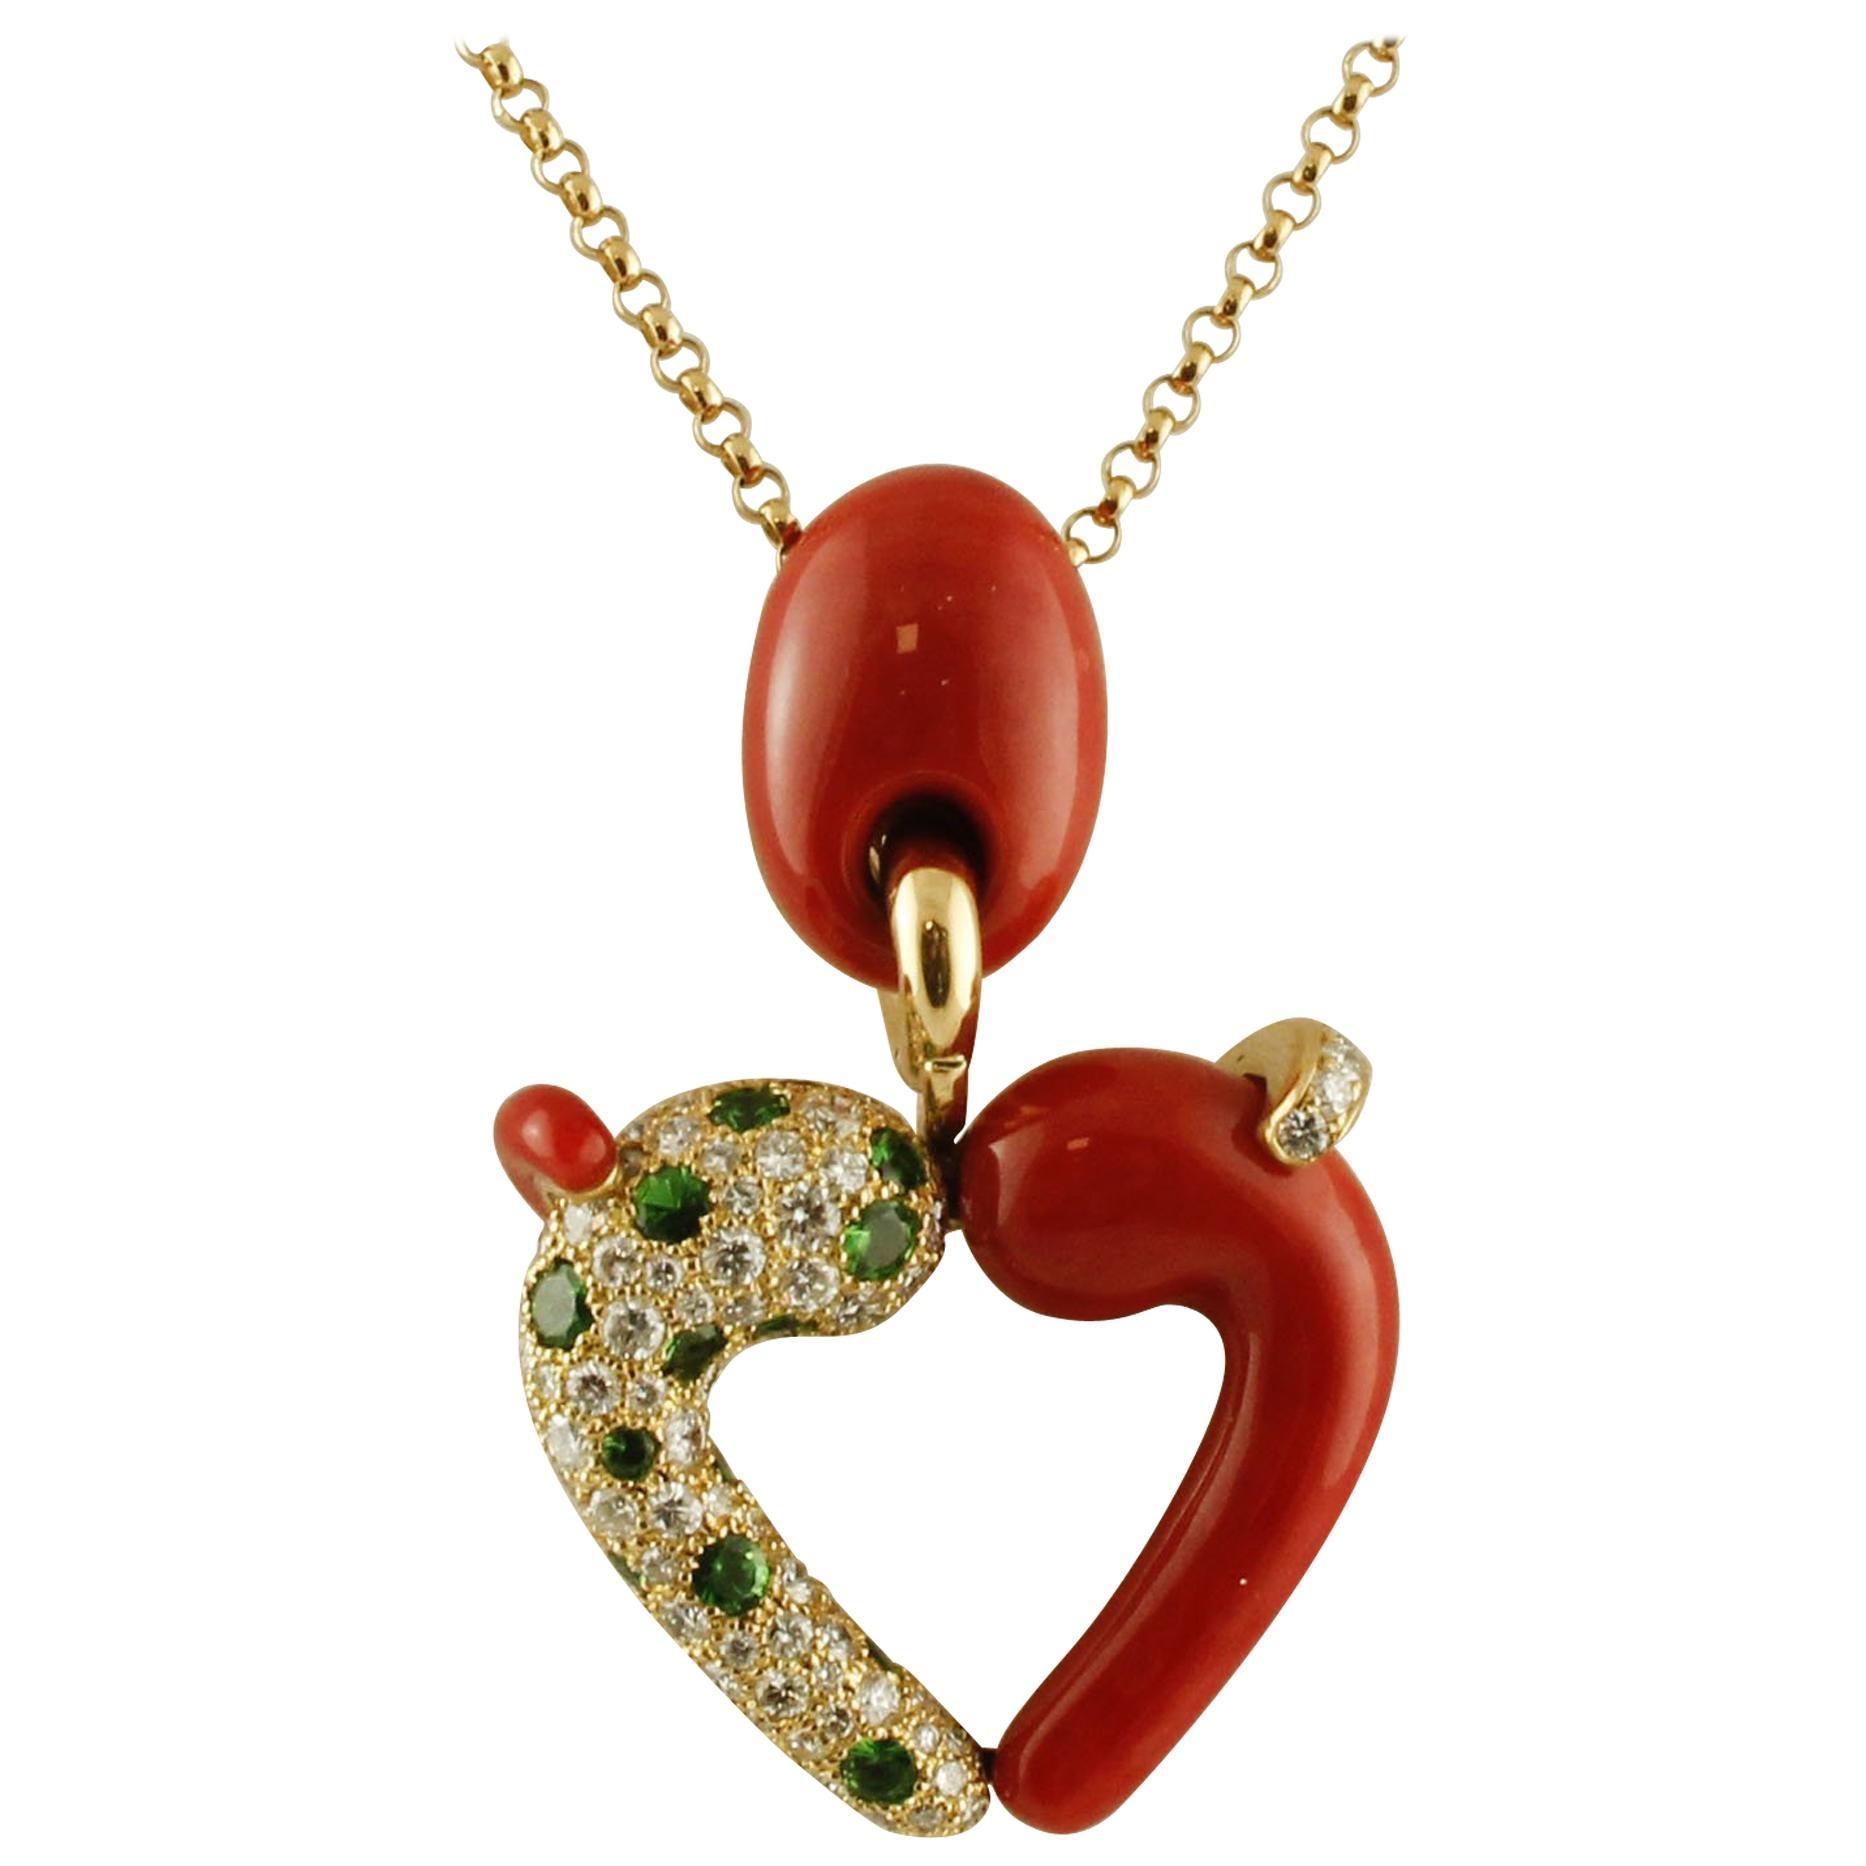 White Diamonds,Tsavorites,Red Coral,18K Yellow Gold Heart Shape Pendant Necklace